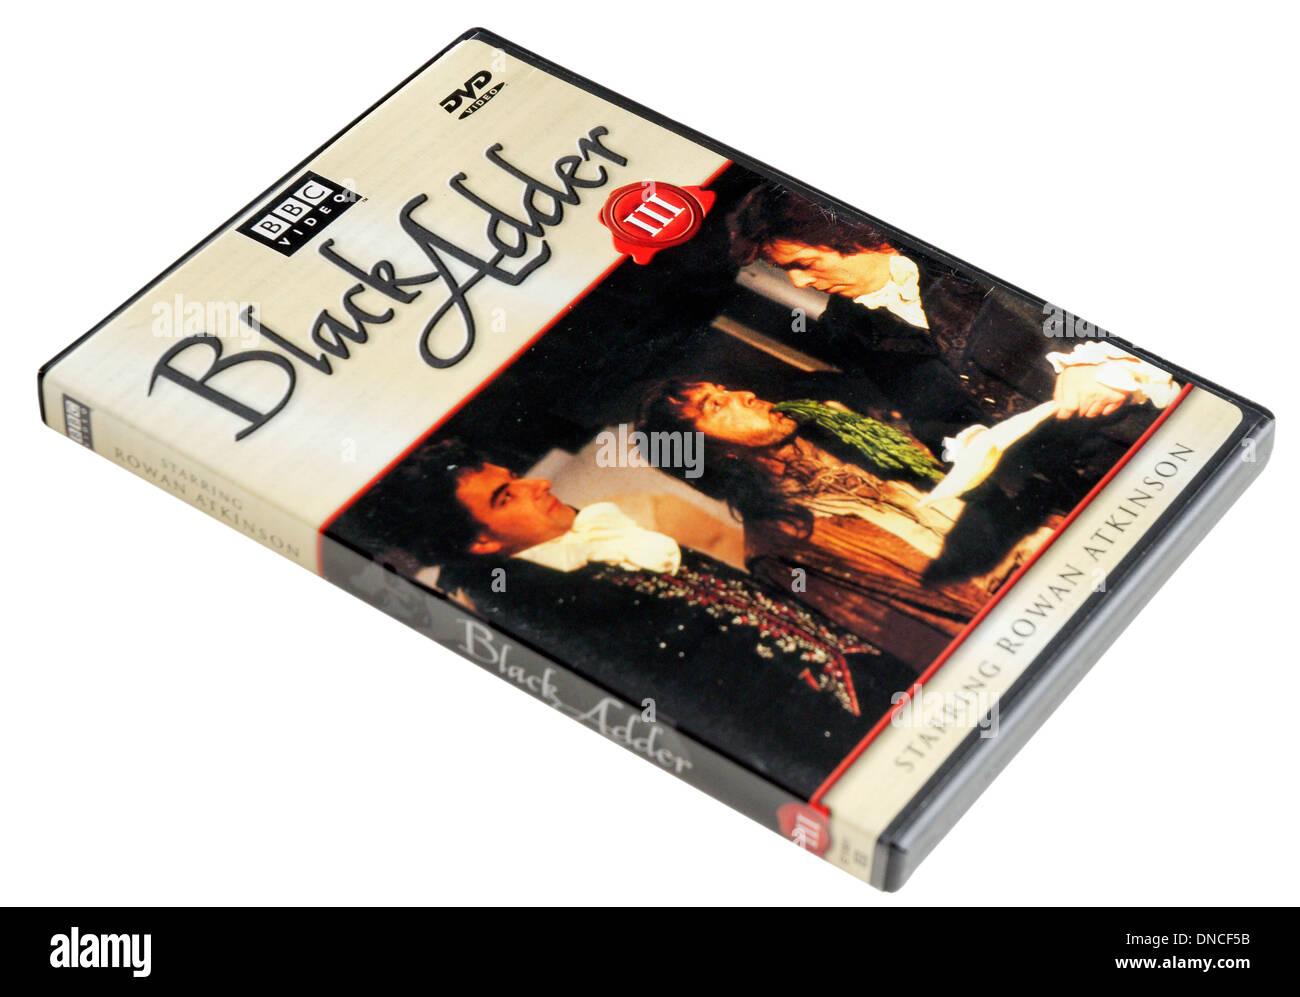 Blackadder III BBC TV Comedy classics DVD - Stock Image